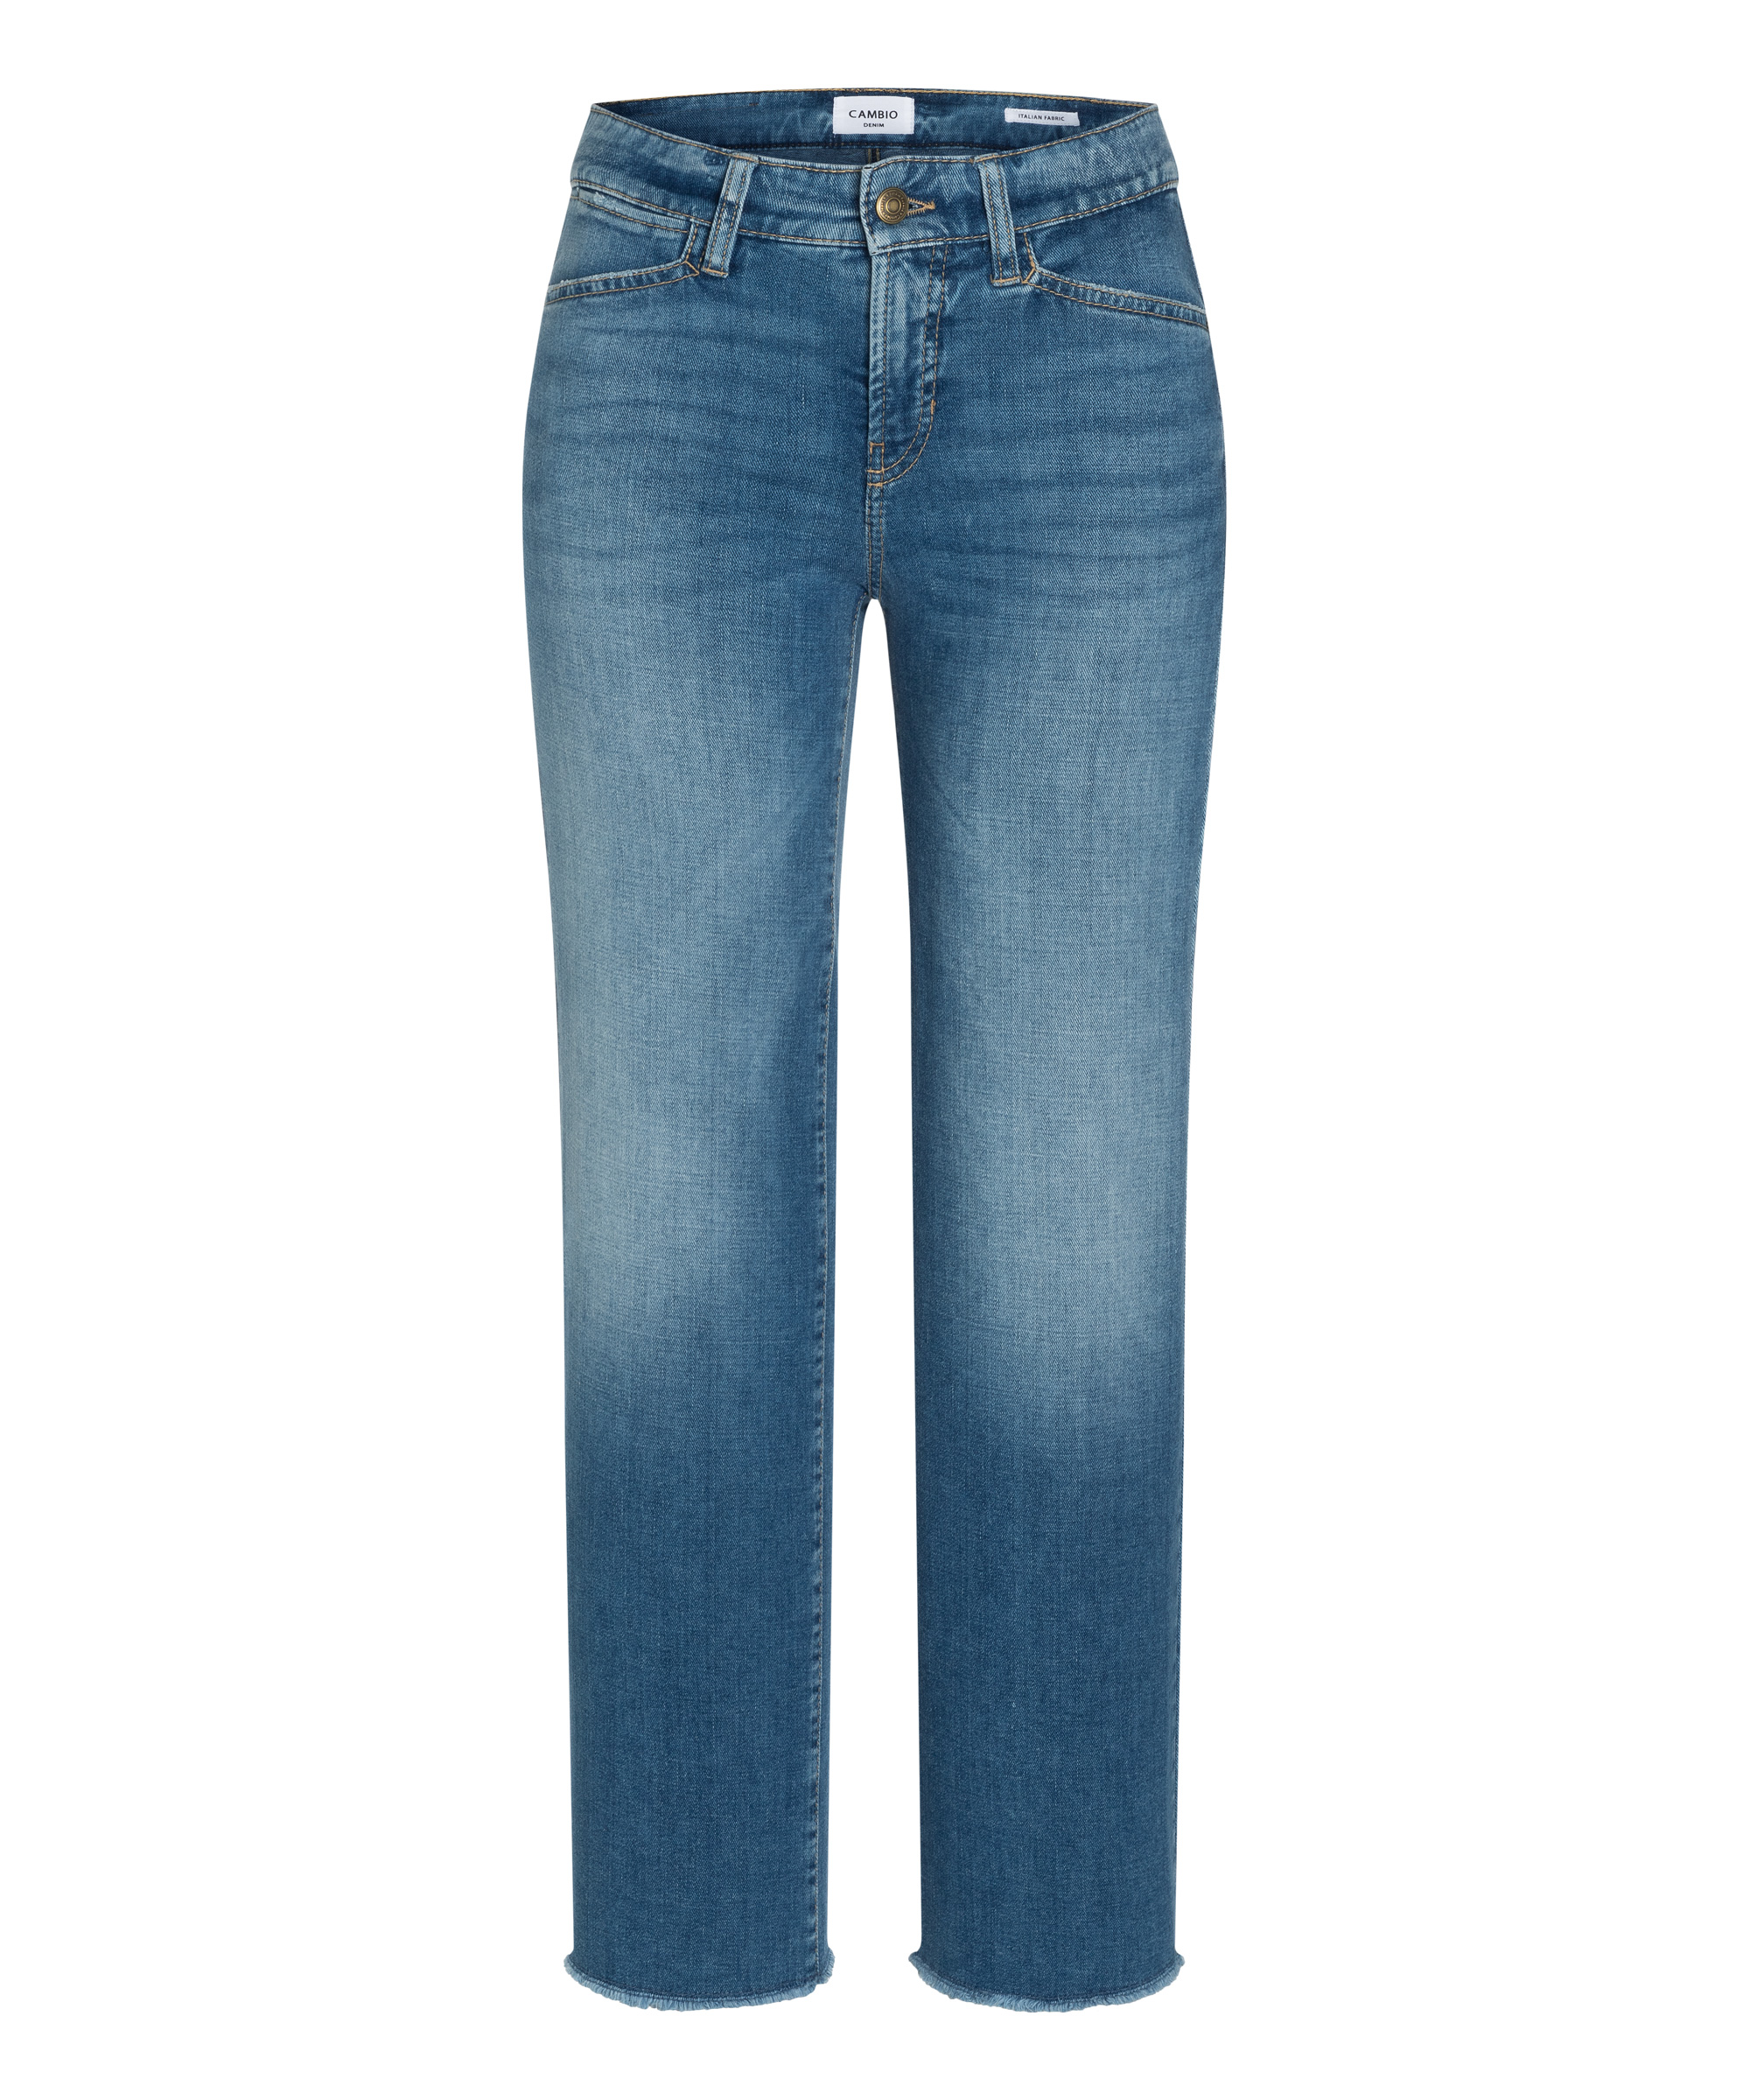 Cambio Jeans Christie MEDIUM SUMMER FRINGED HEM